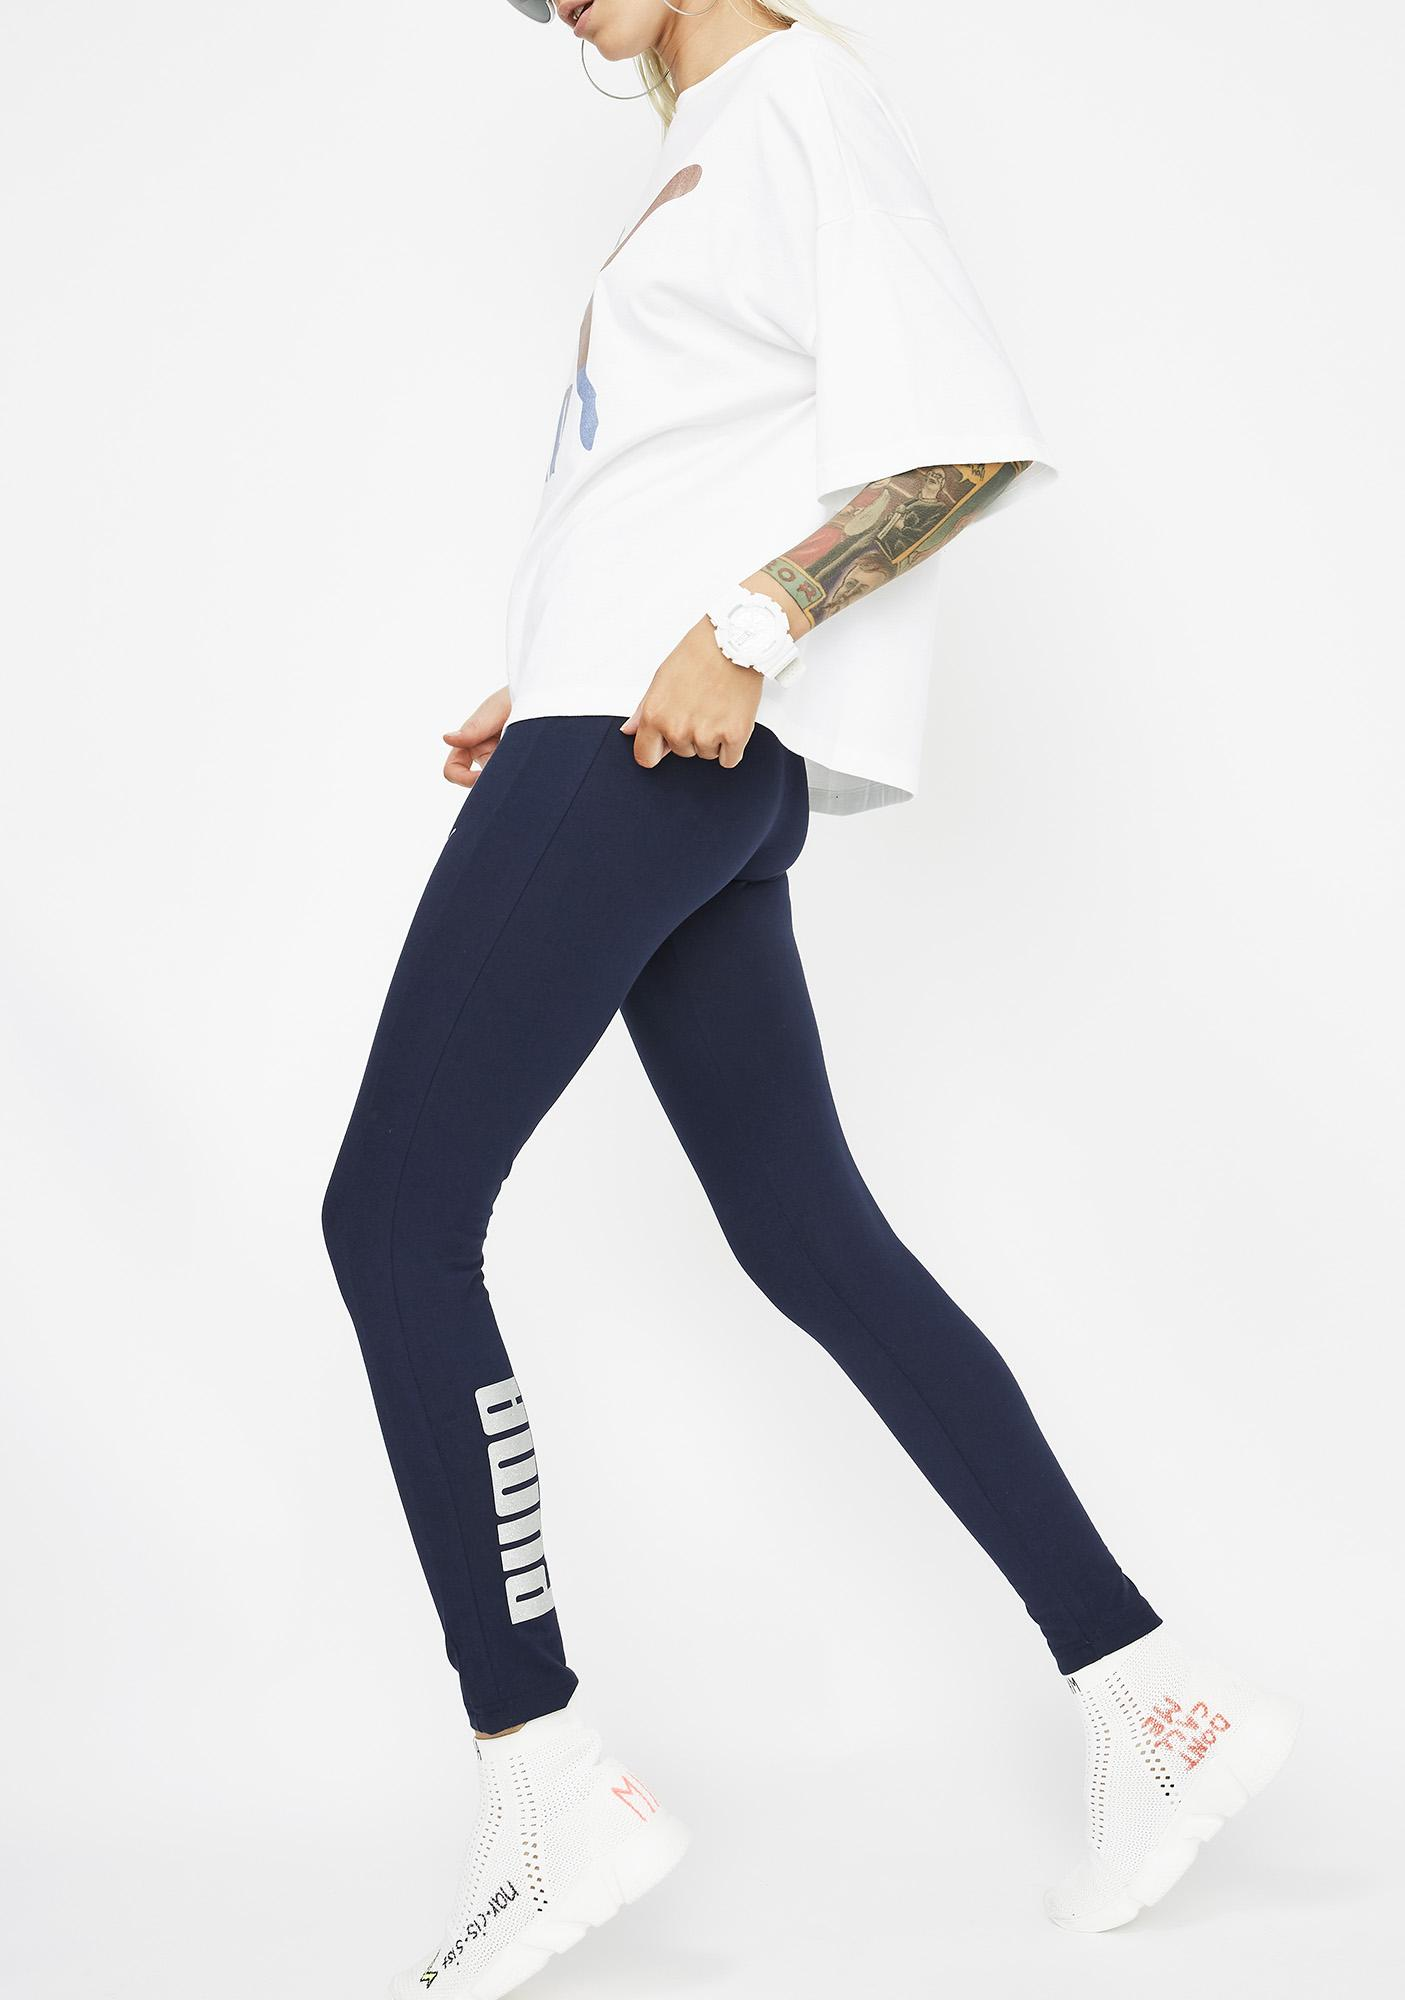 PUMA Peacoat Glam Leggings